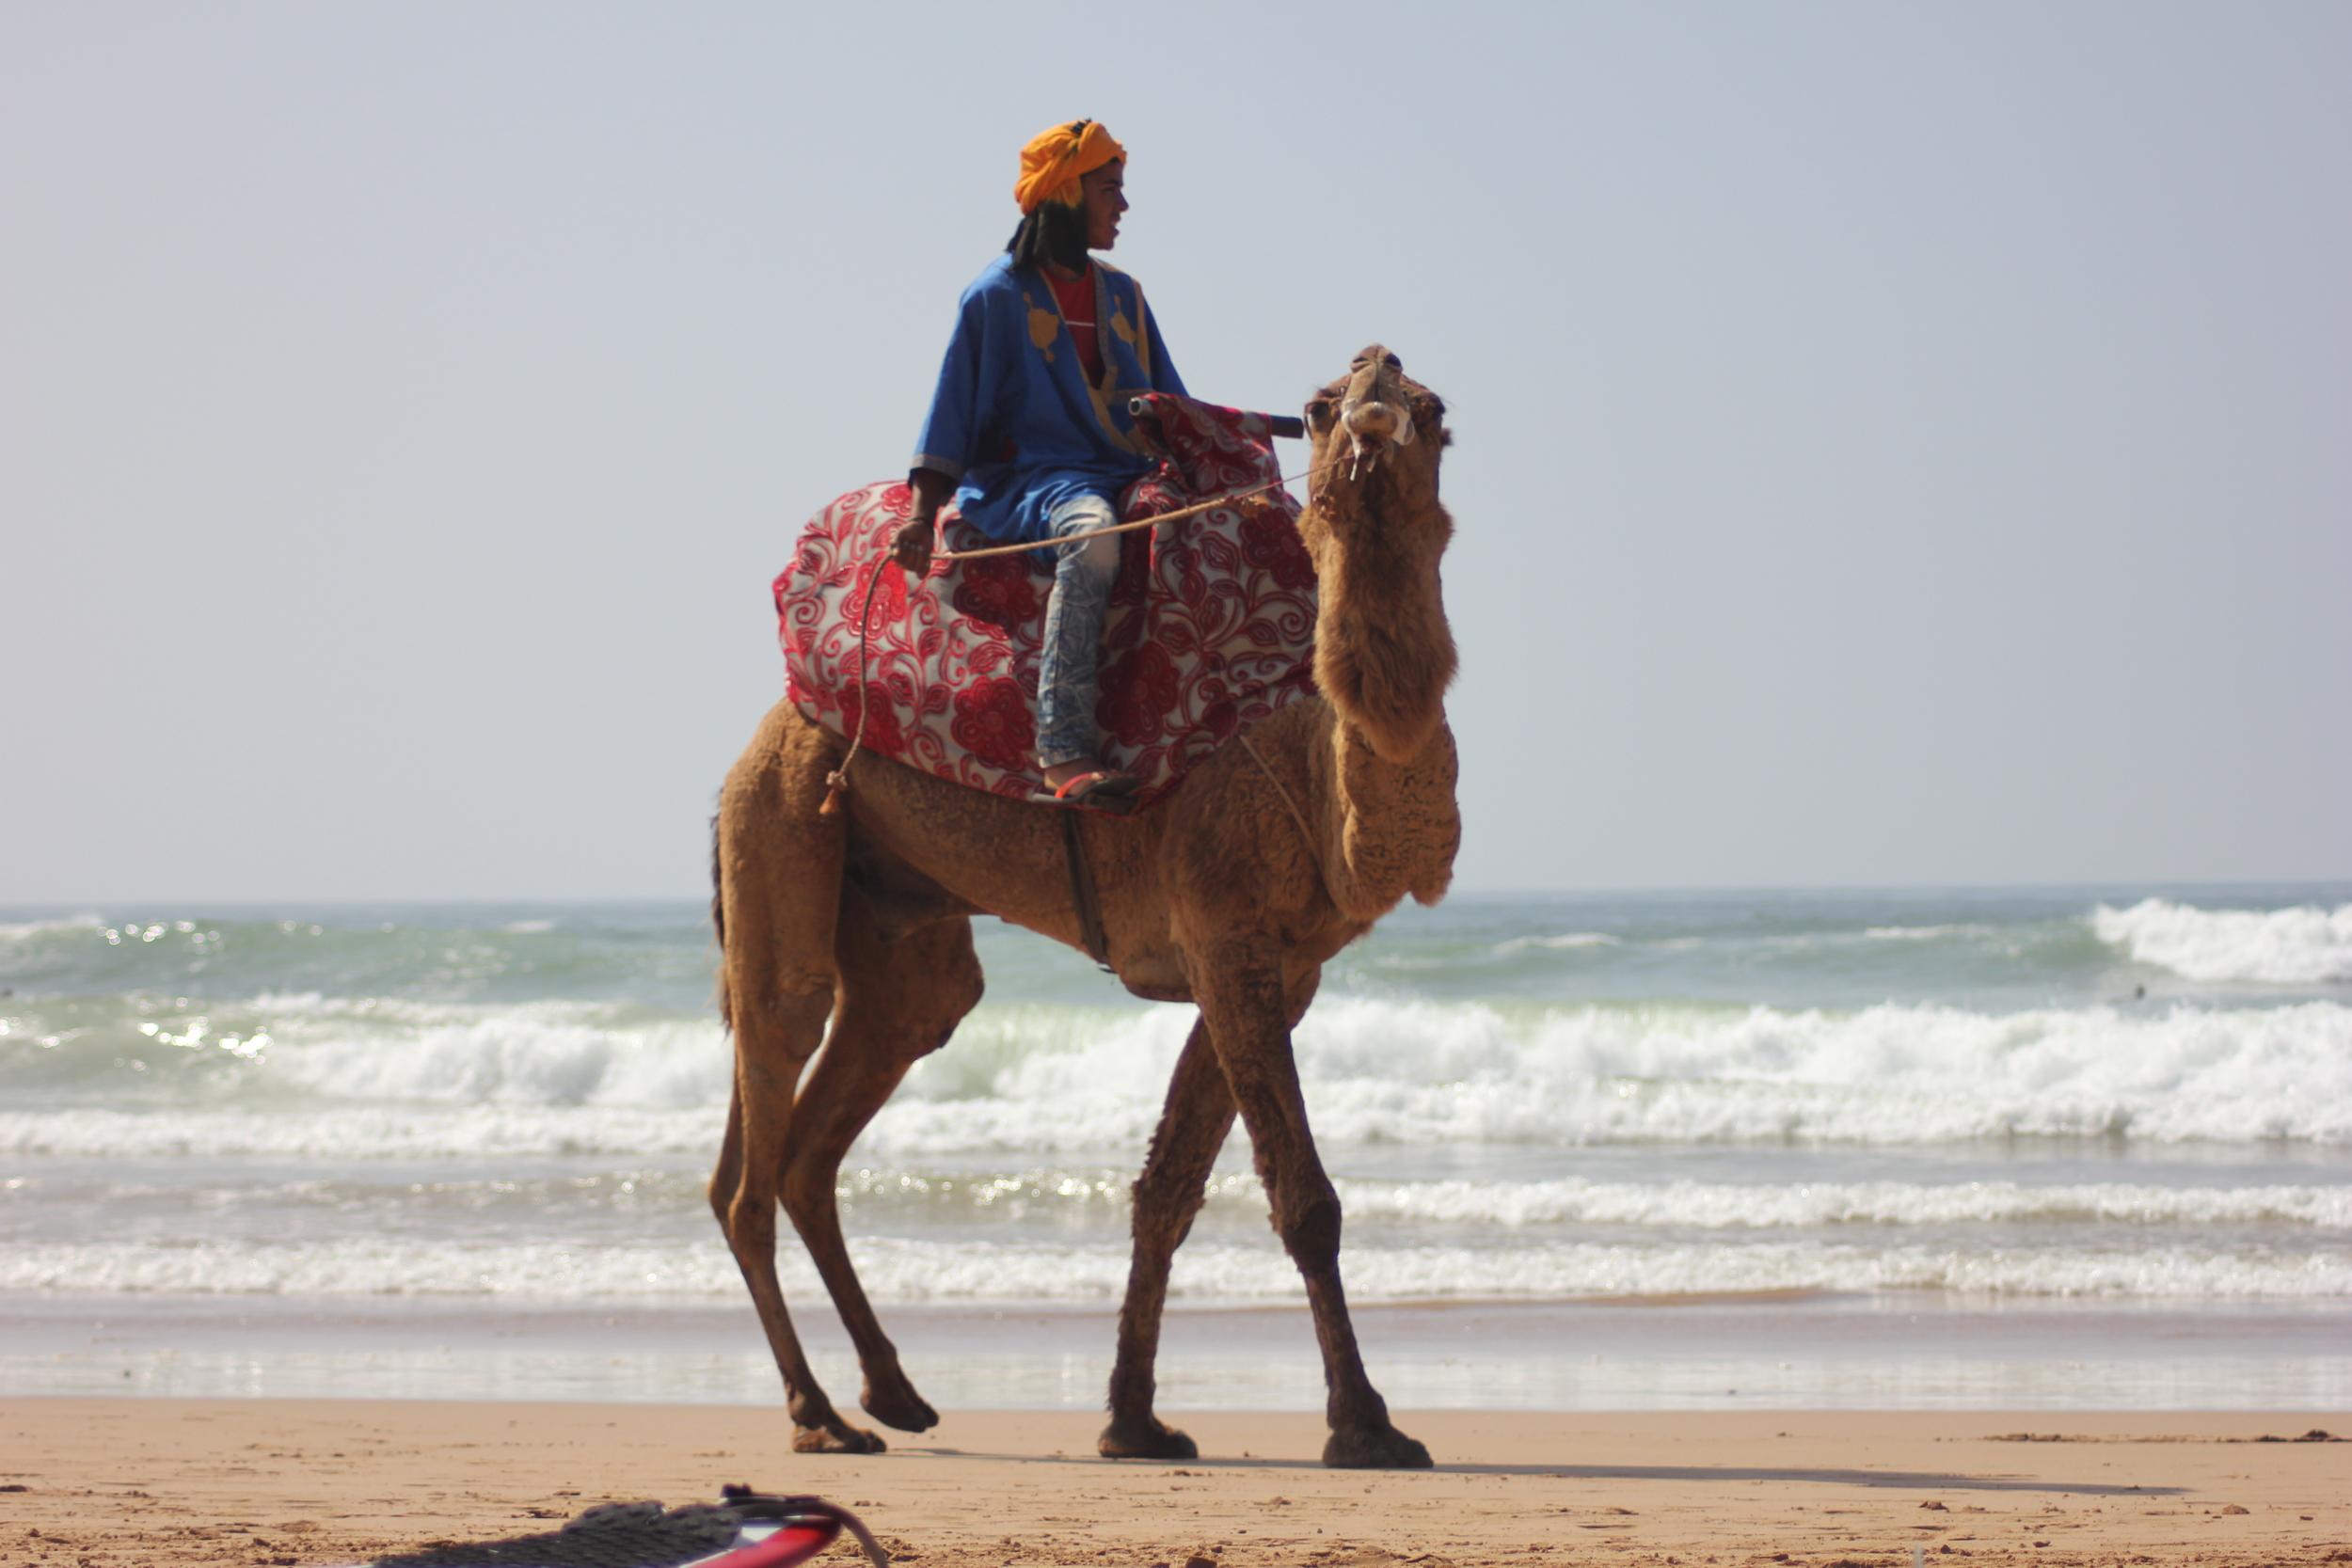 Beachside camel